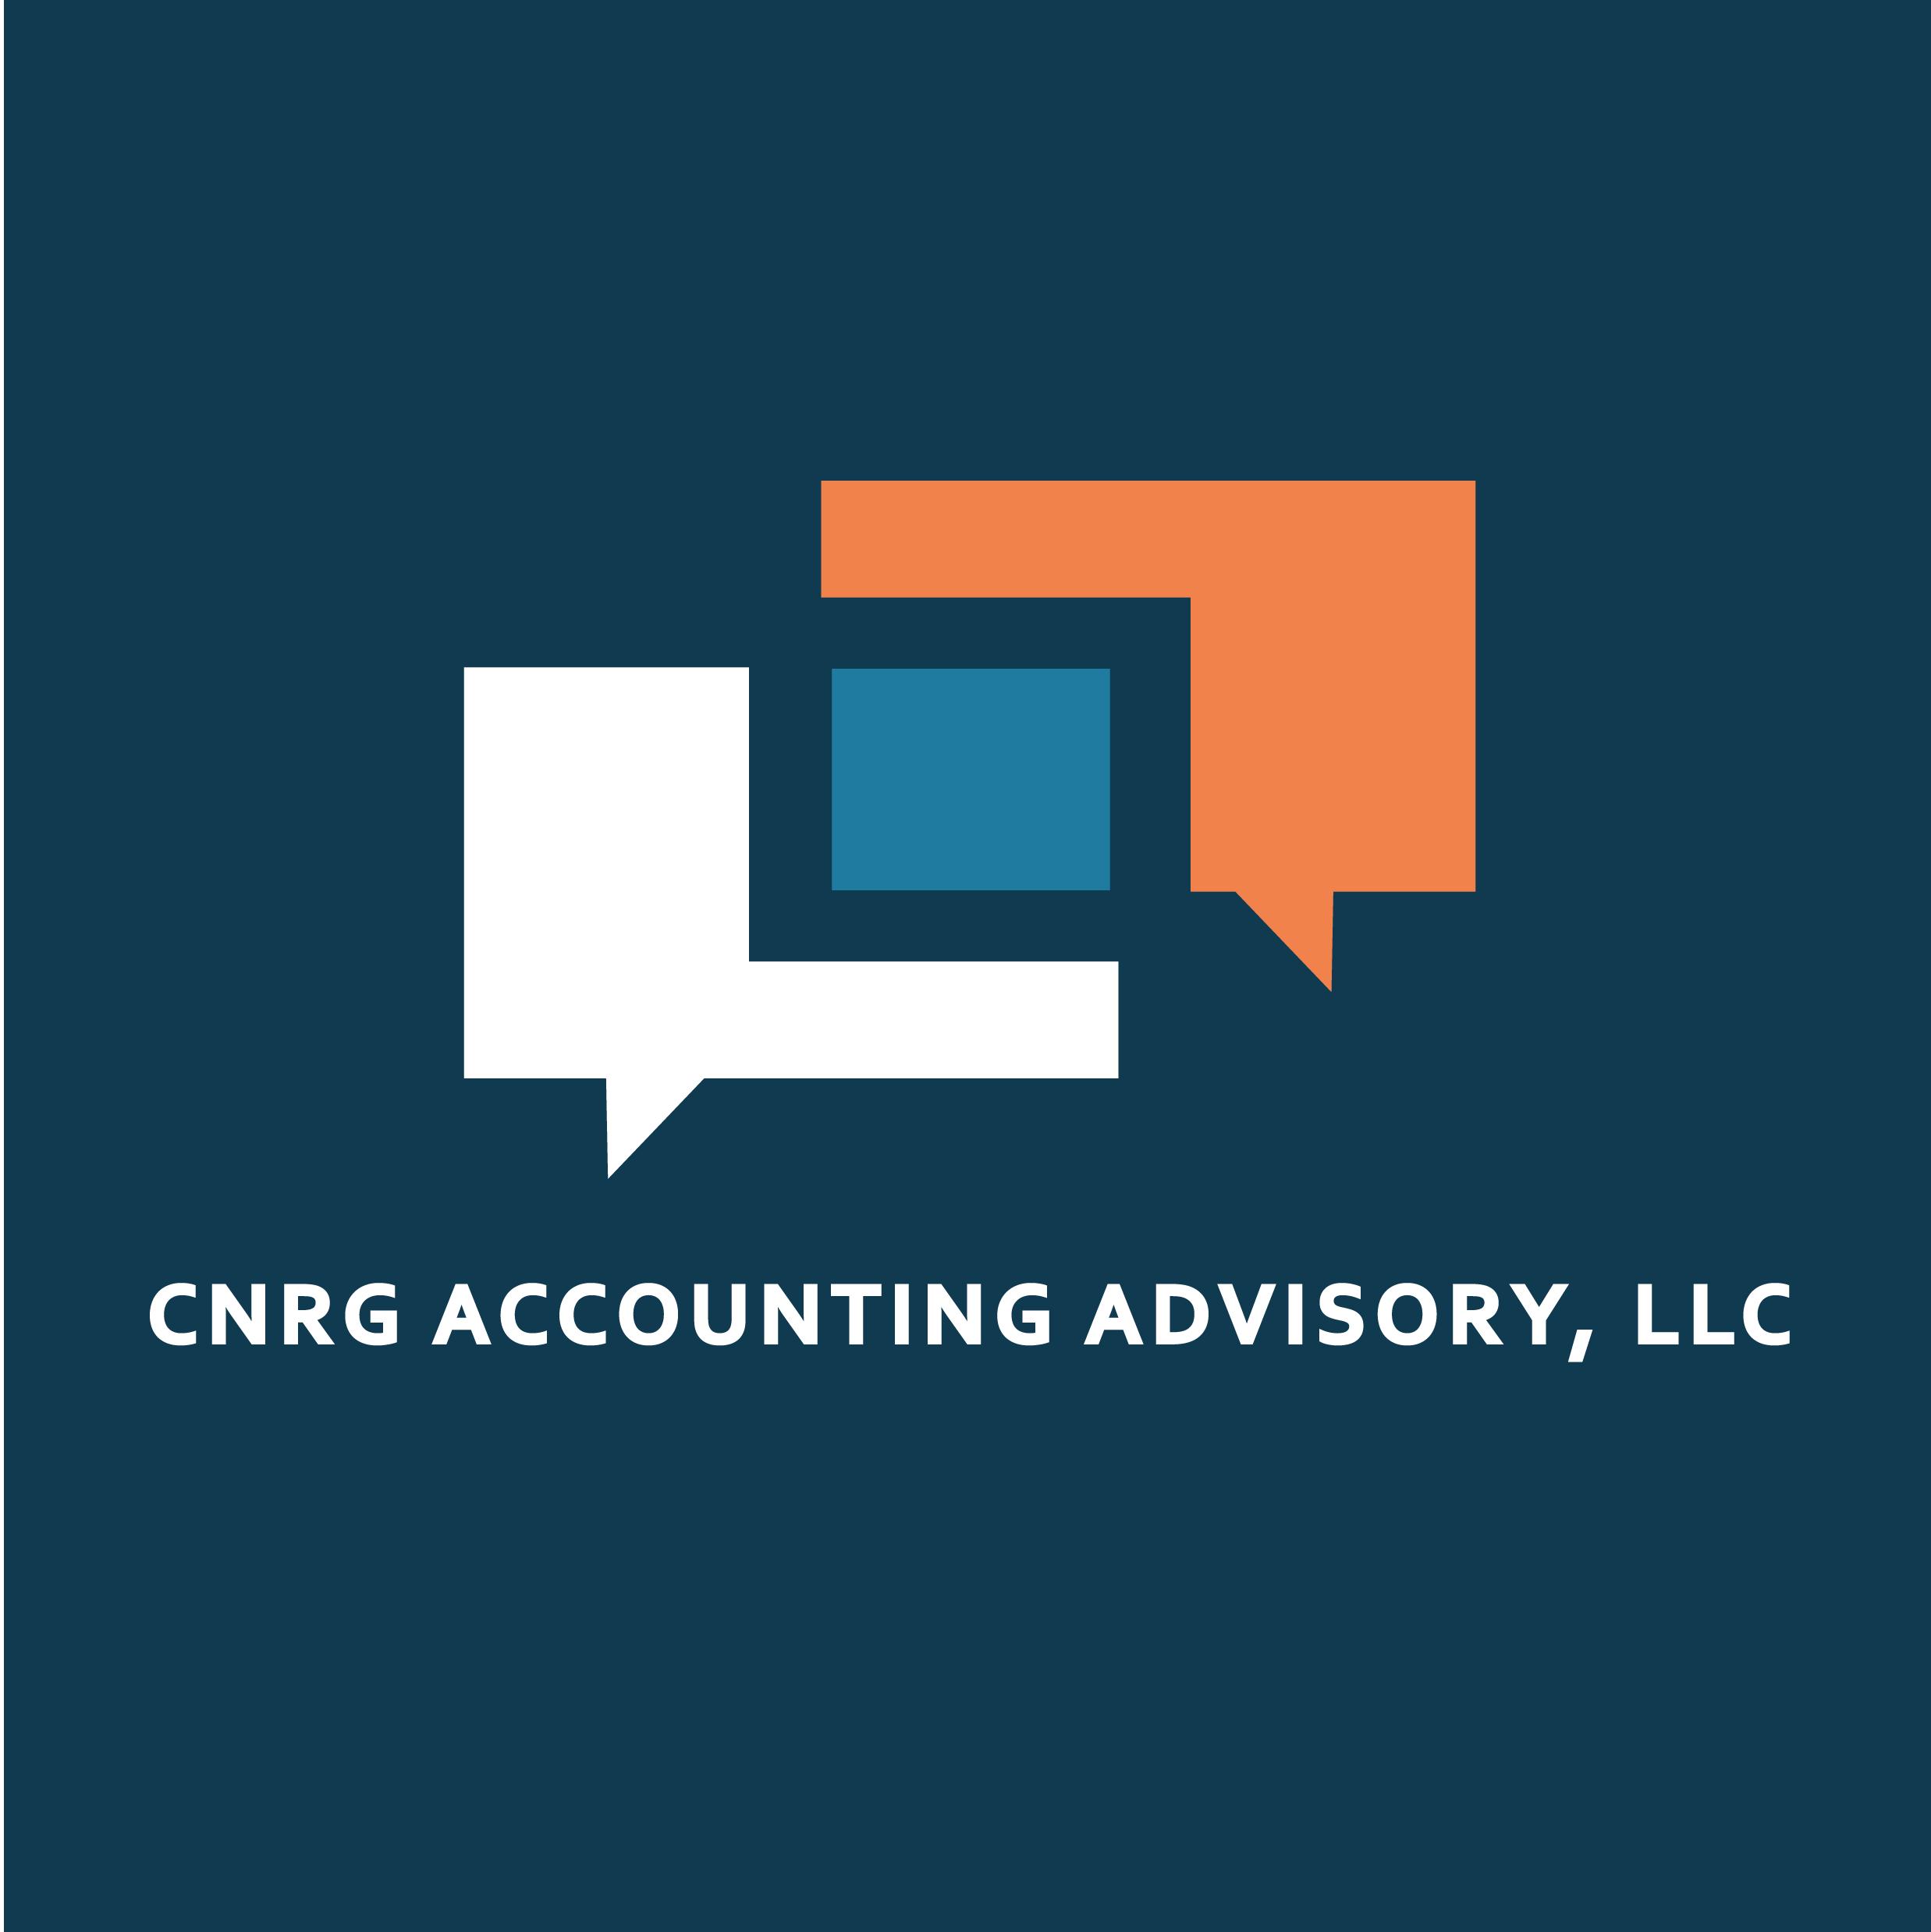 CNRG Accounting Advisory